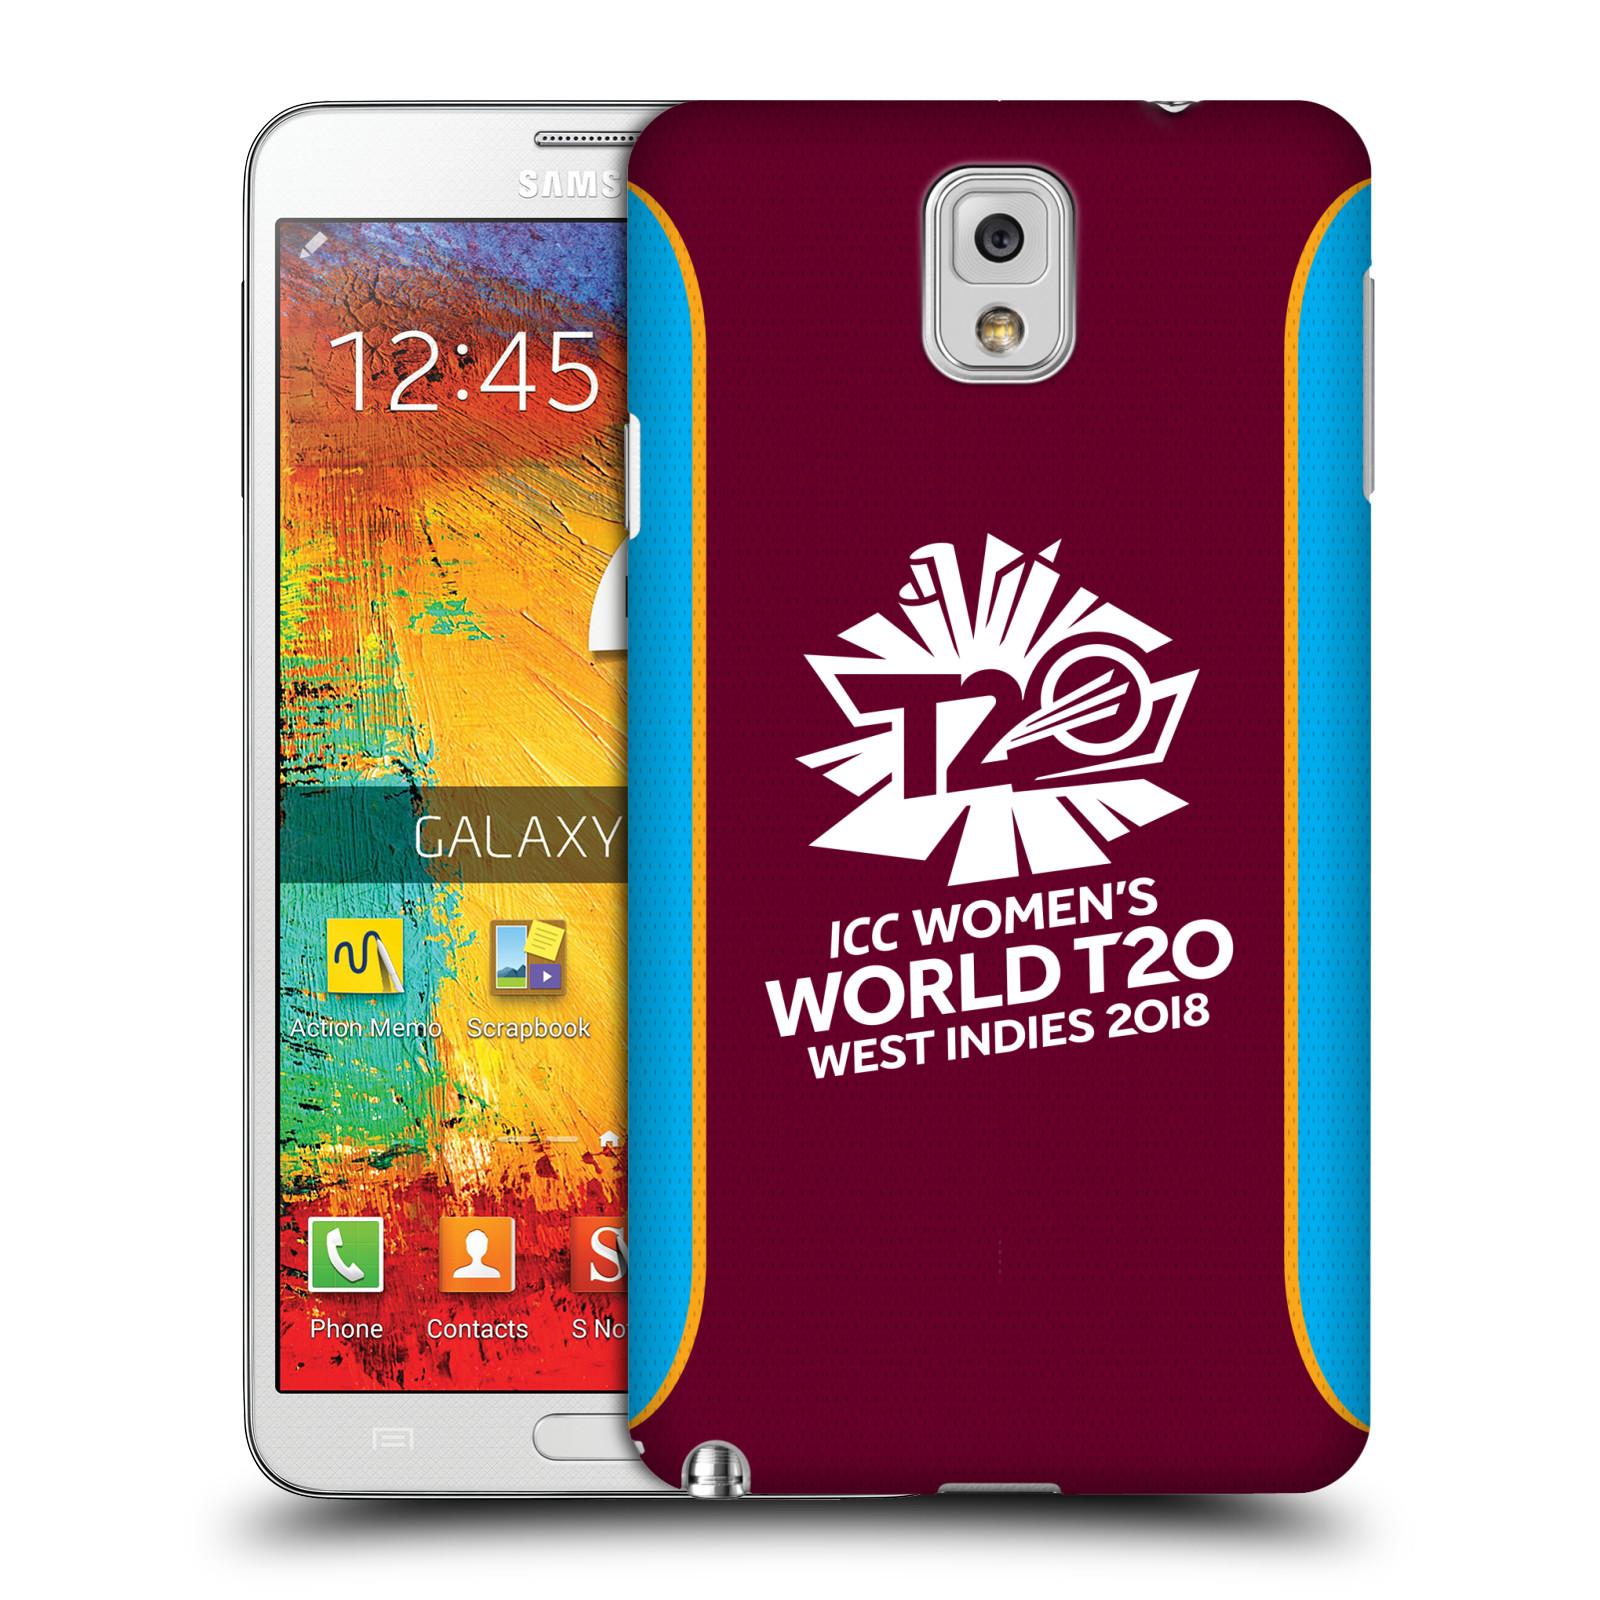 Oficial-ICC-para-mujer-World-T20-Cricket-Funda-Rigida-Posterior-Para-Telefonos-Samsung-2